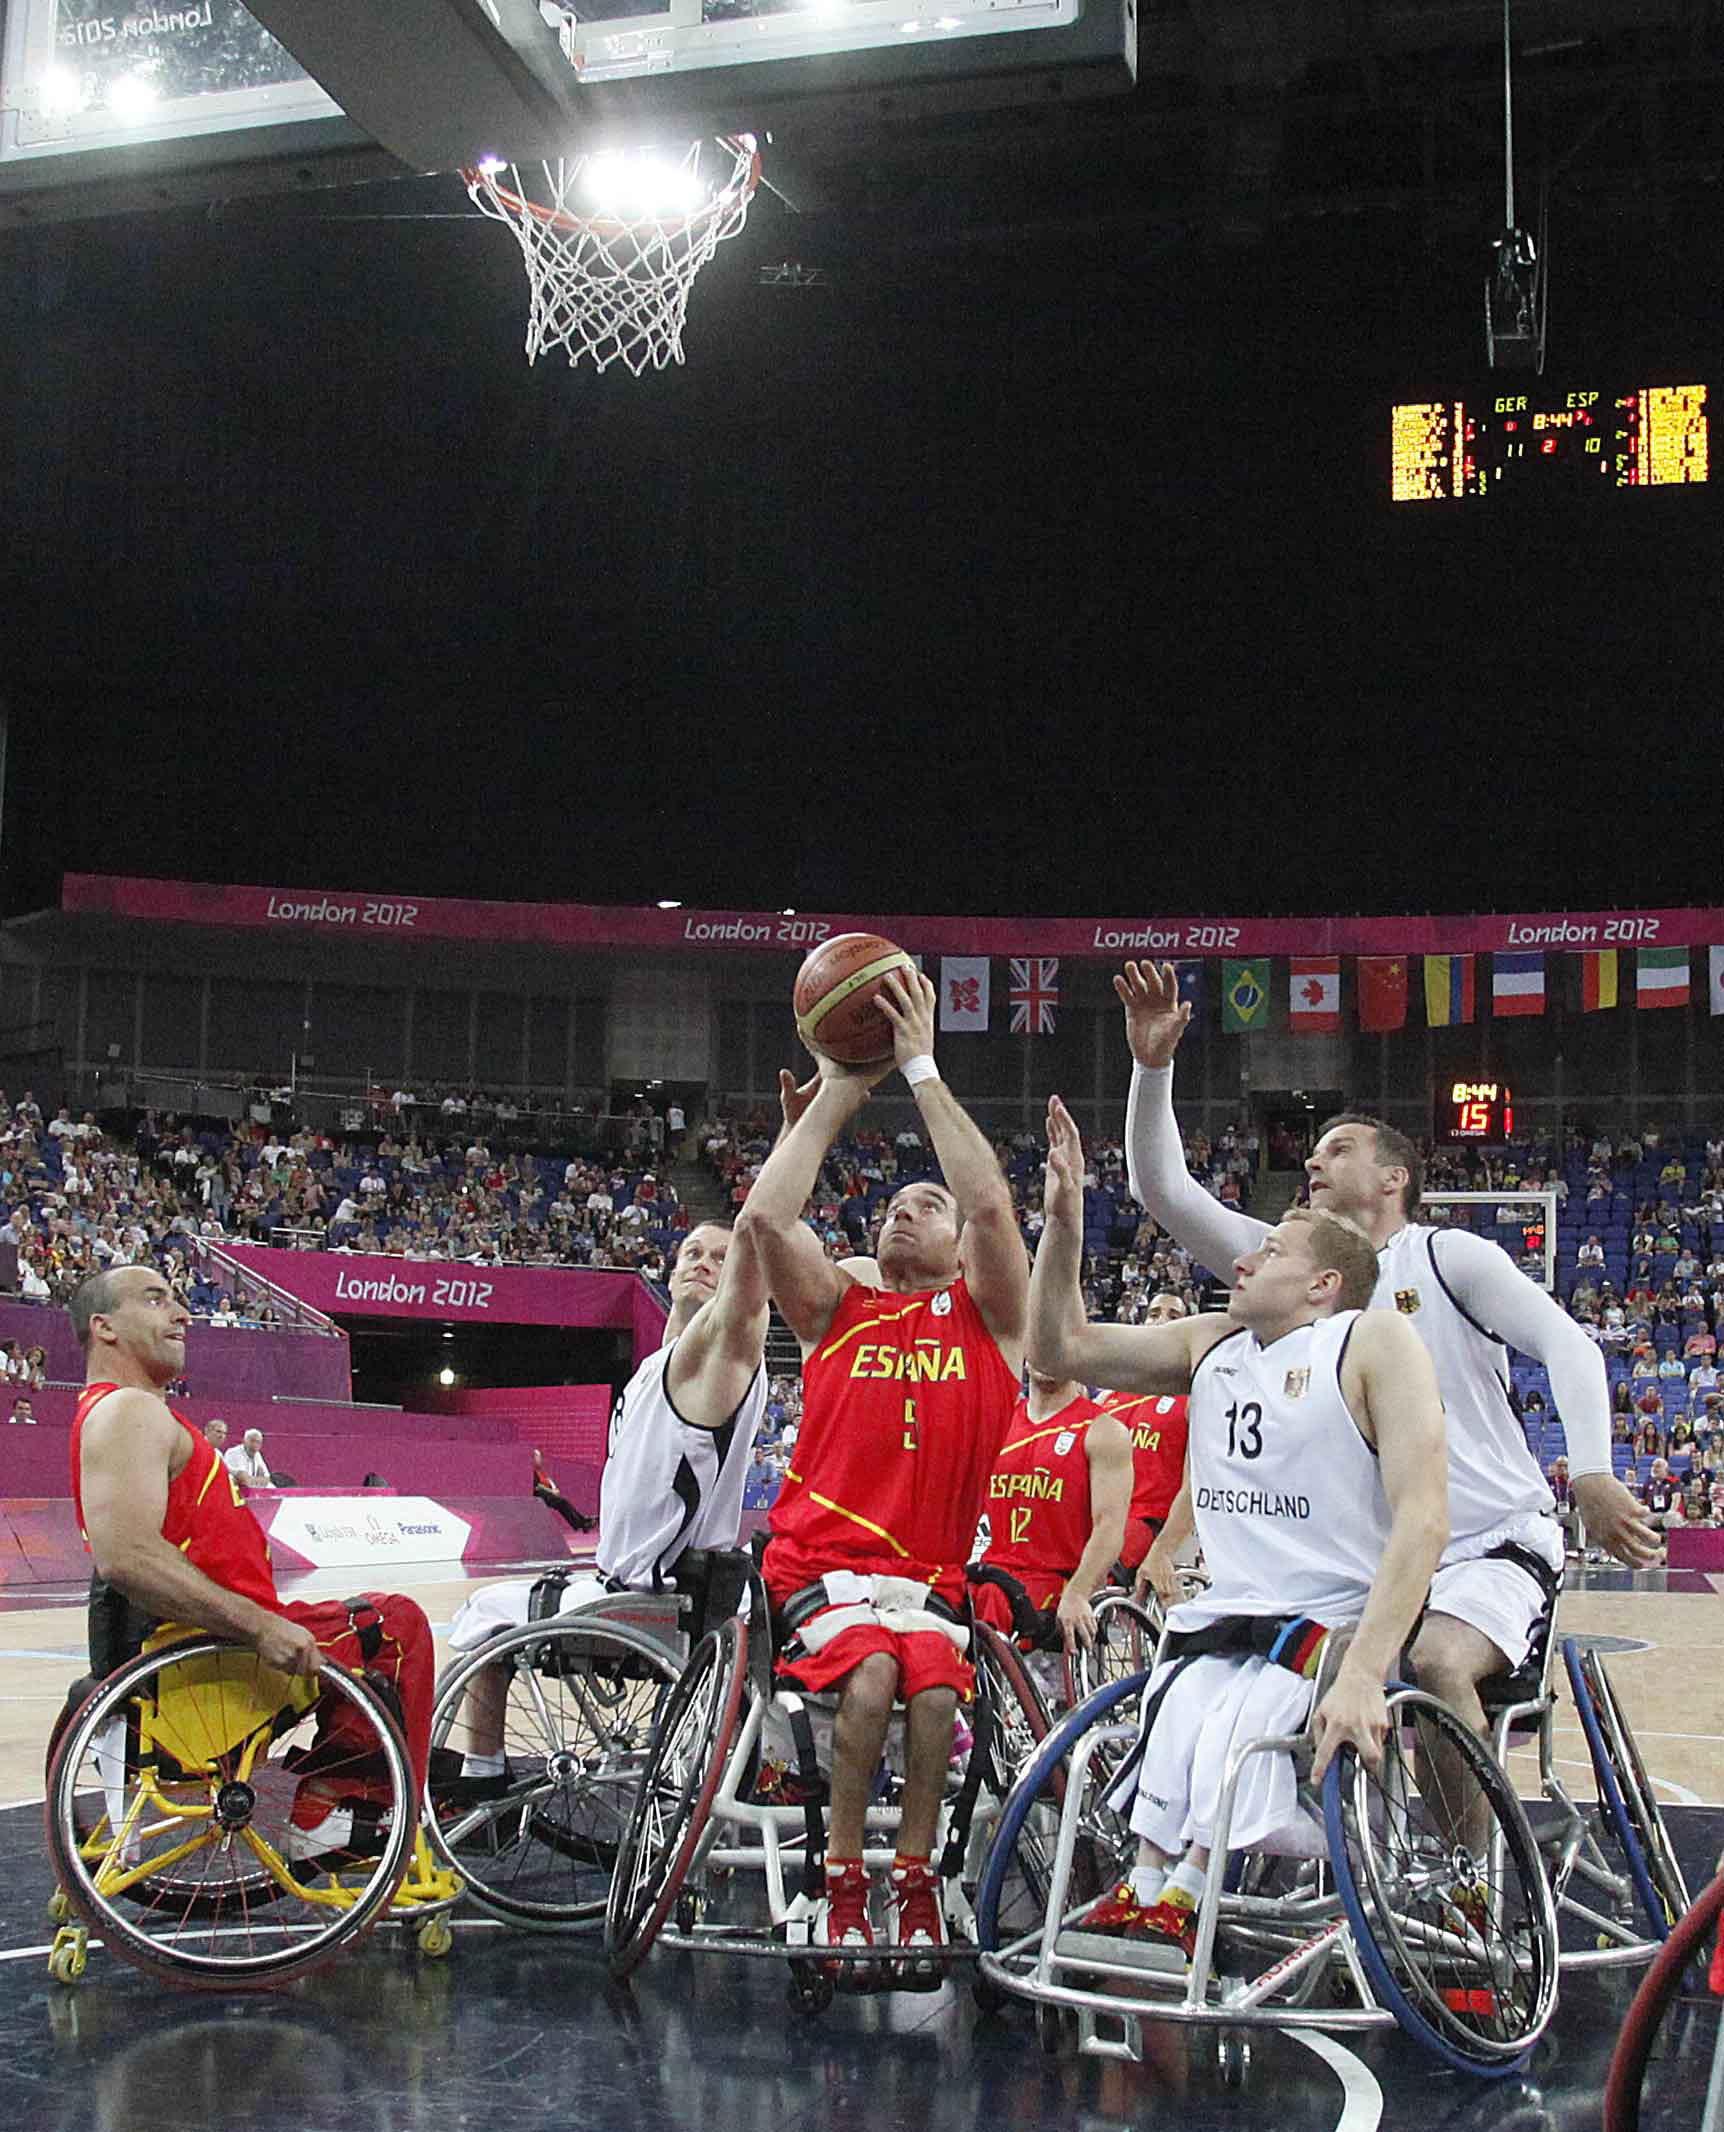 Baloncesto en silla de ruedas paral mpicos - Baloncesto silla de ruedas ...